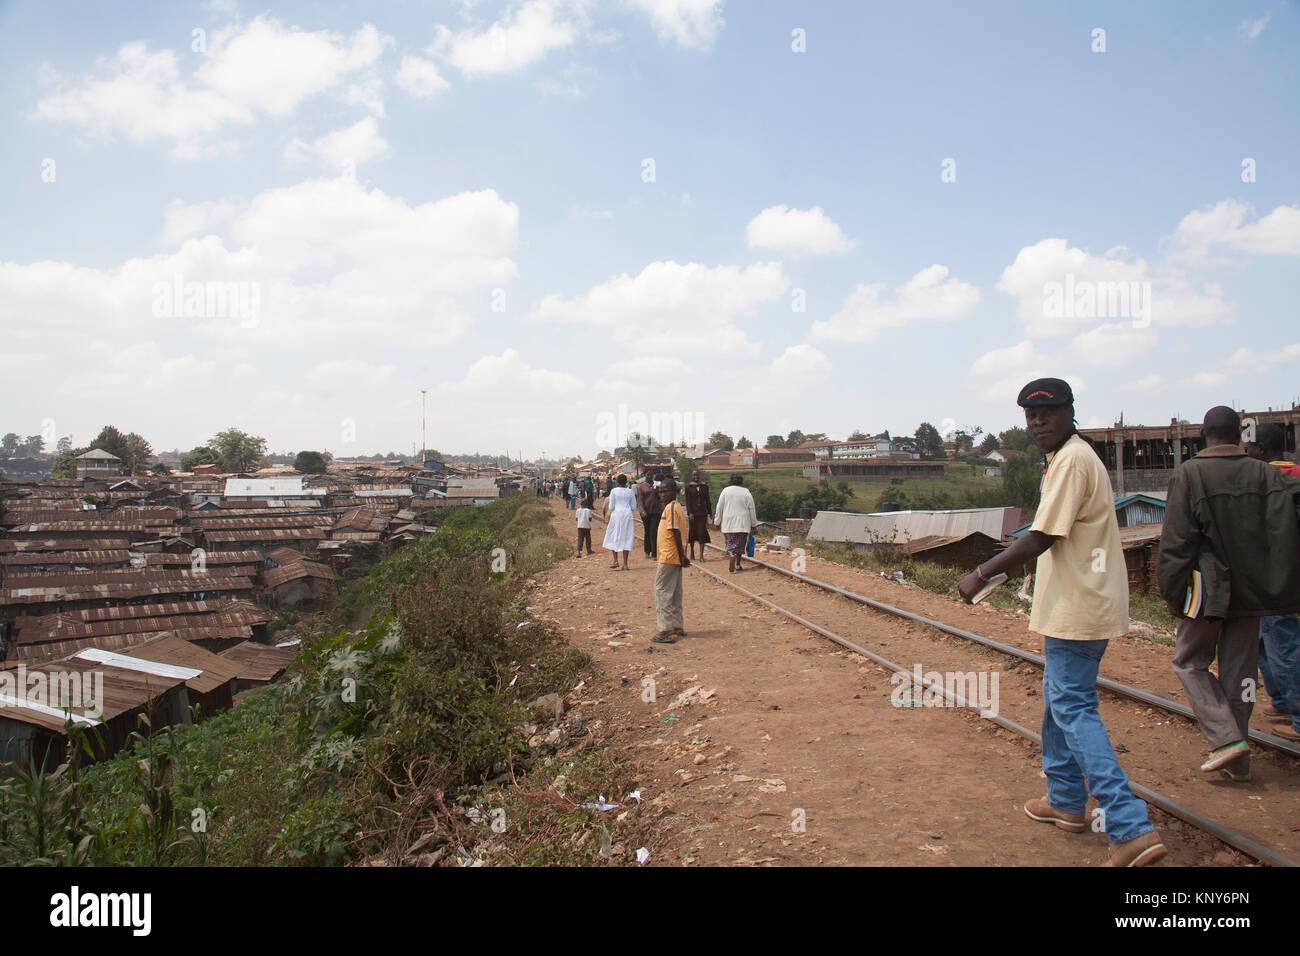 Kibera slums, Nairobi, Kenya, East Africa Stock Photo